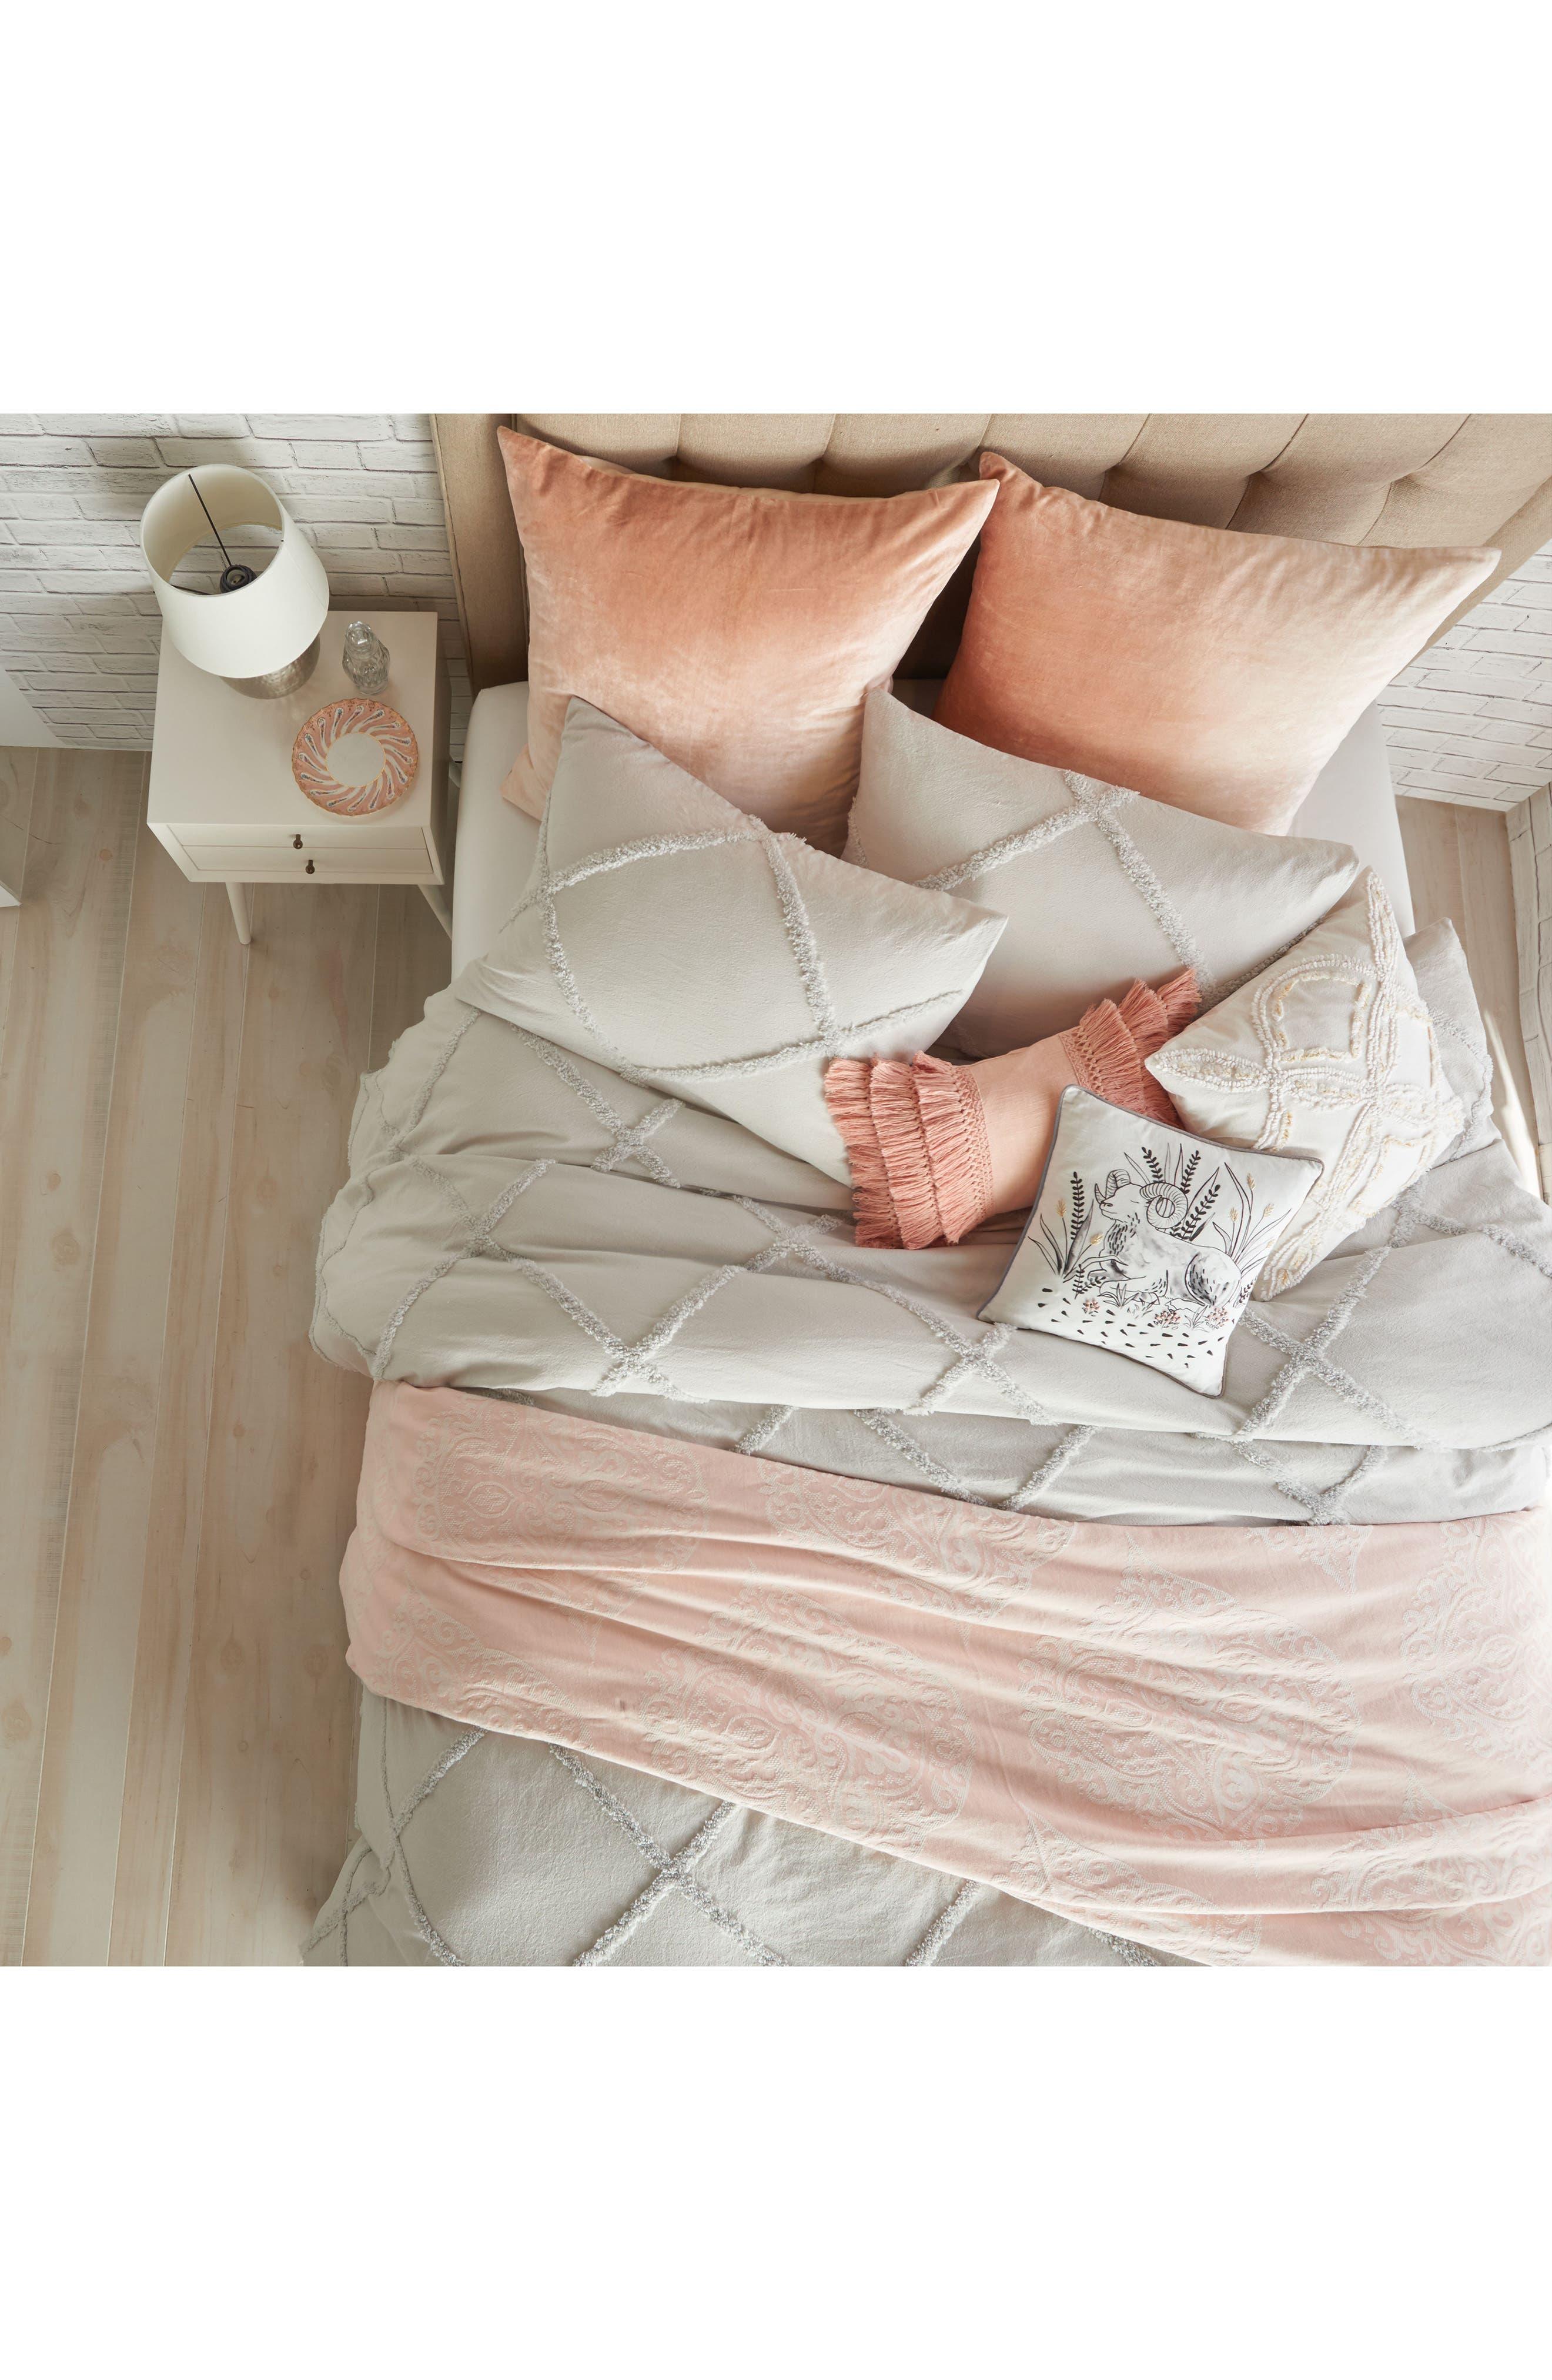 PERI HOME, Chenille Lattice Comforter Set, Main thumbnail 1, color, GREY